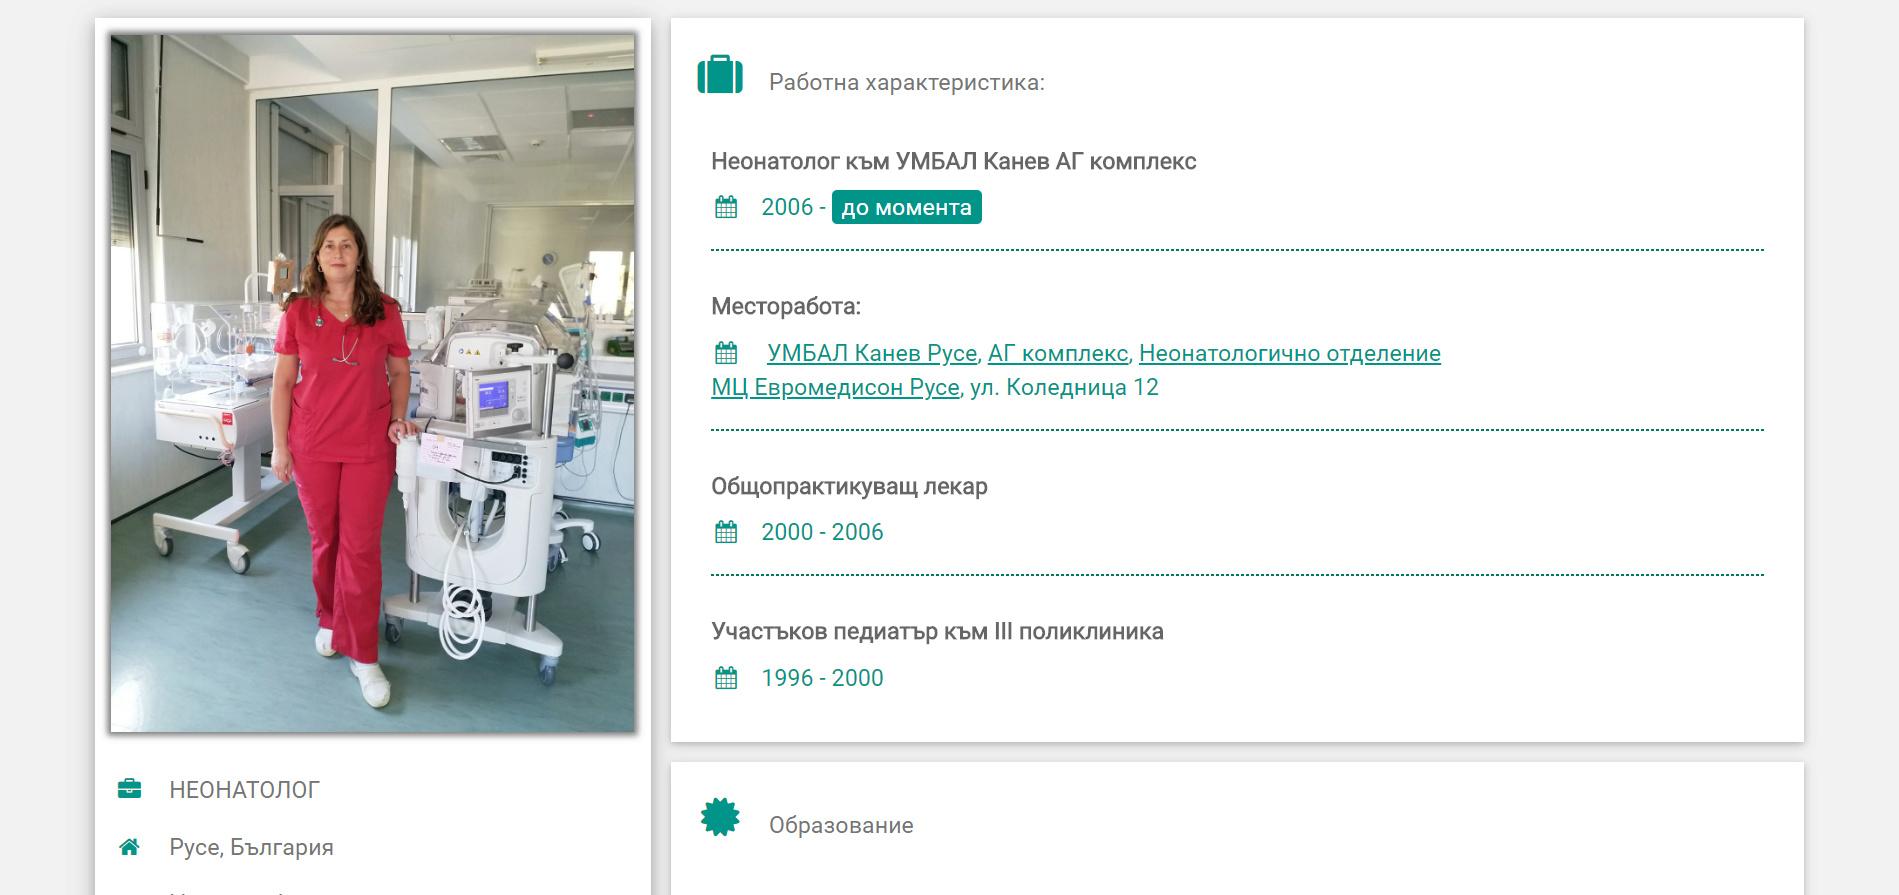 Д-р Лилия Георгиева - НЕОНАТОЛОГ